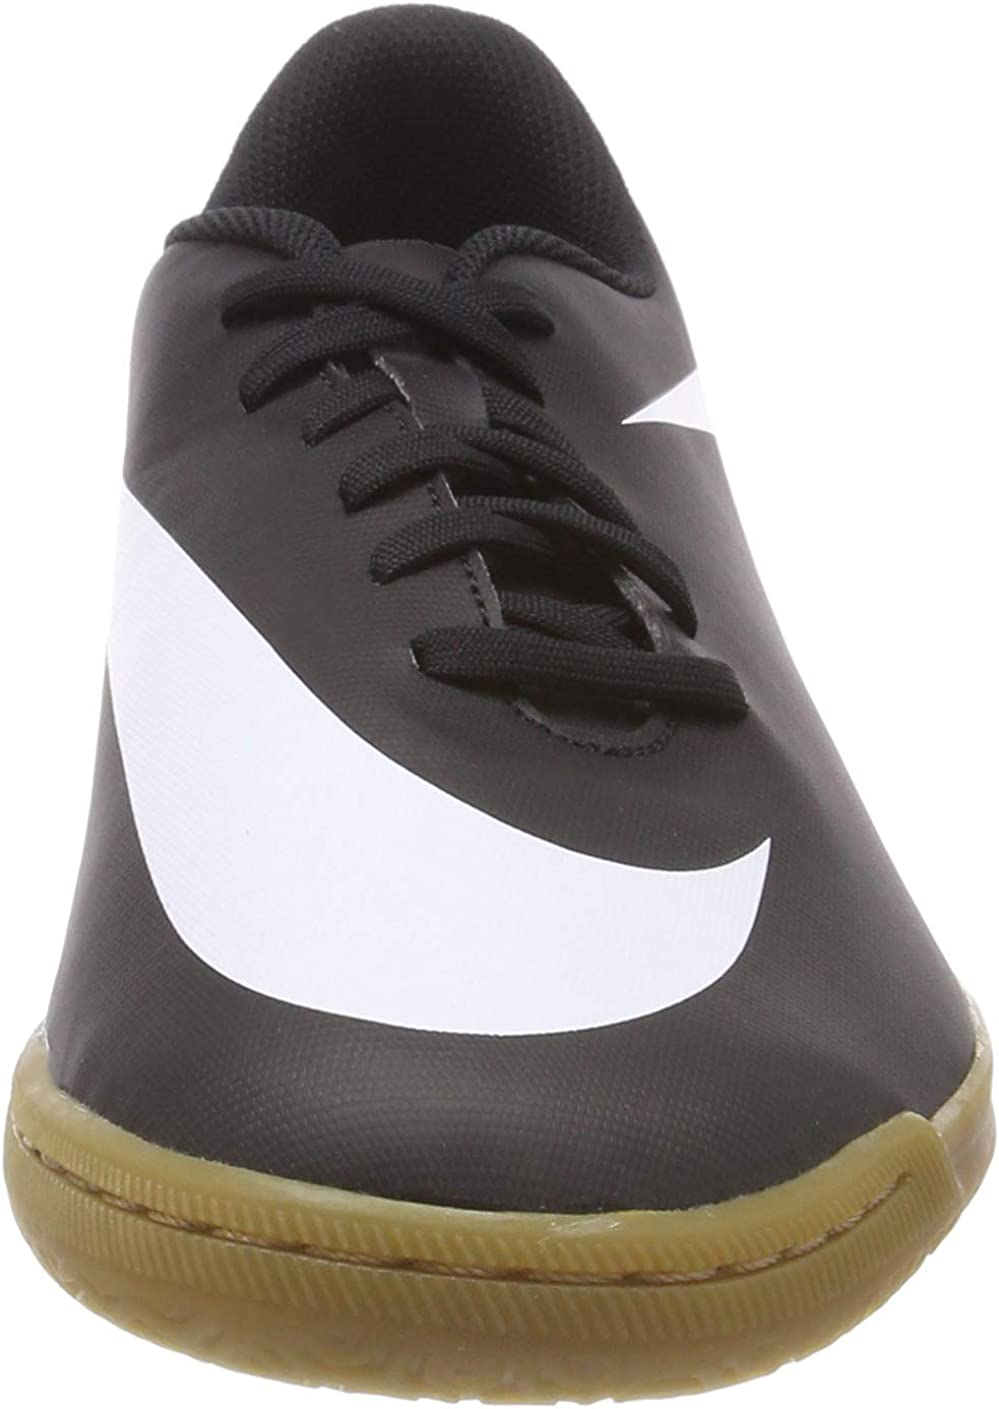 Chaussures de Fitness Homme Nike Bravata II IC